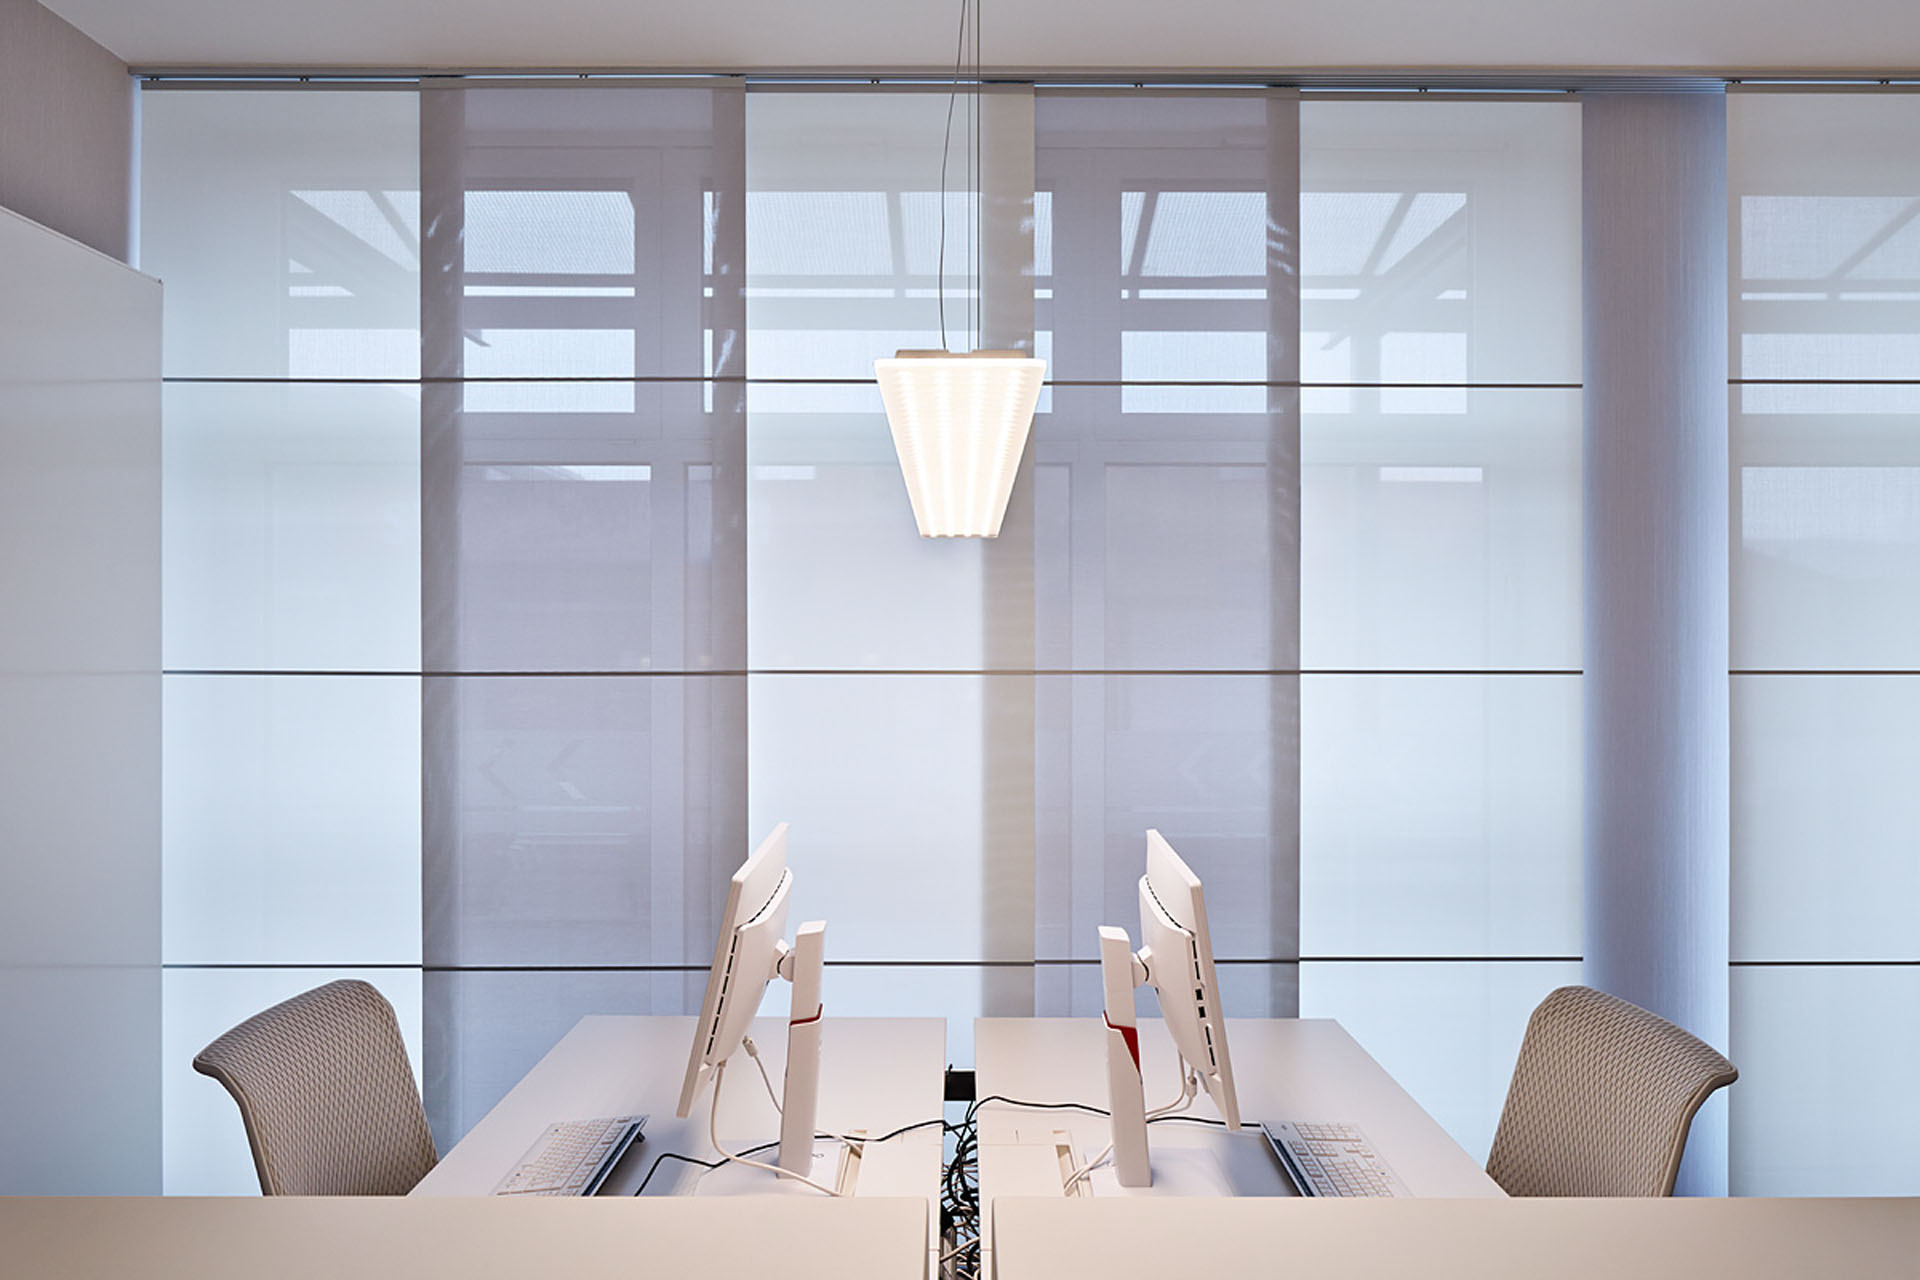 umbau-beleuchtung-steuerbüro-01.jpg